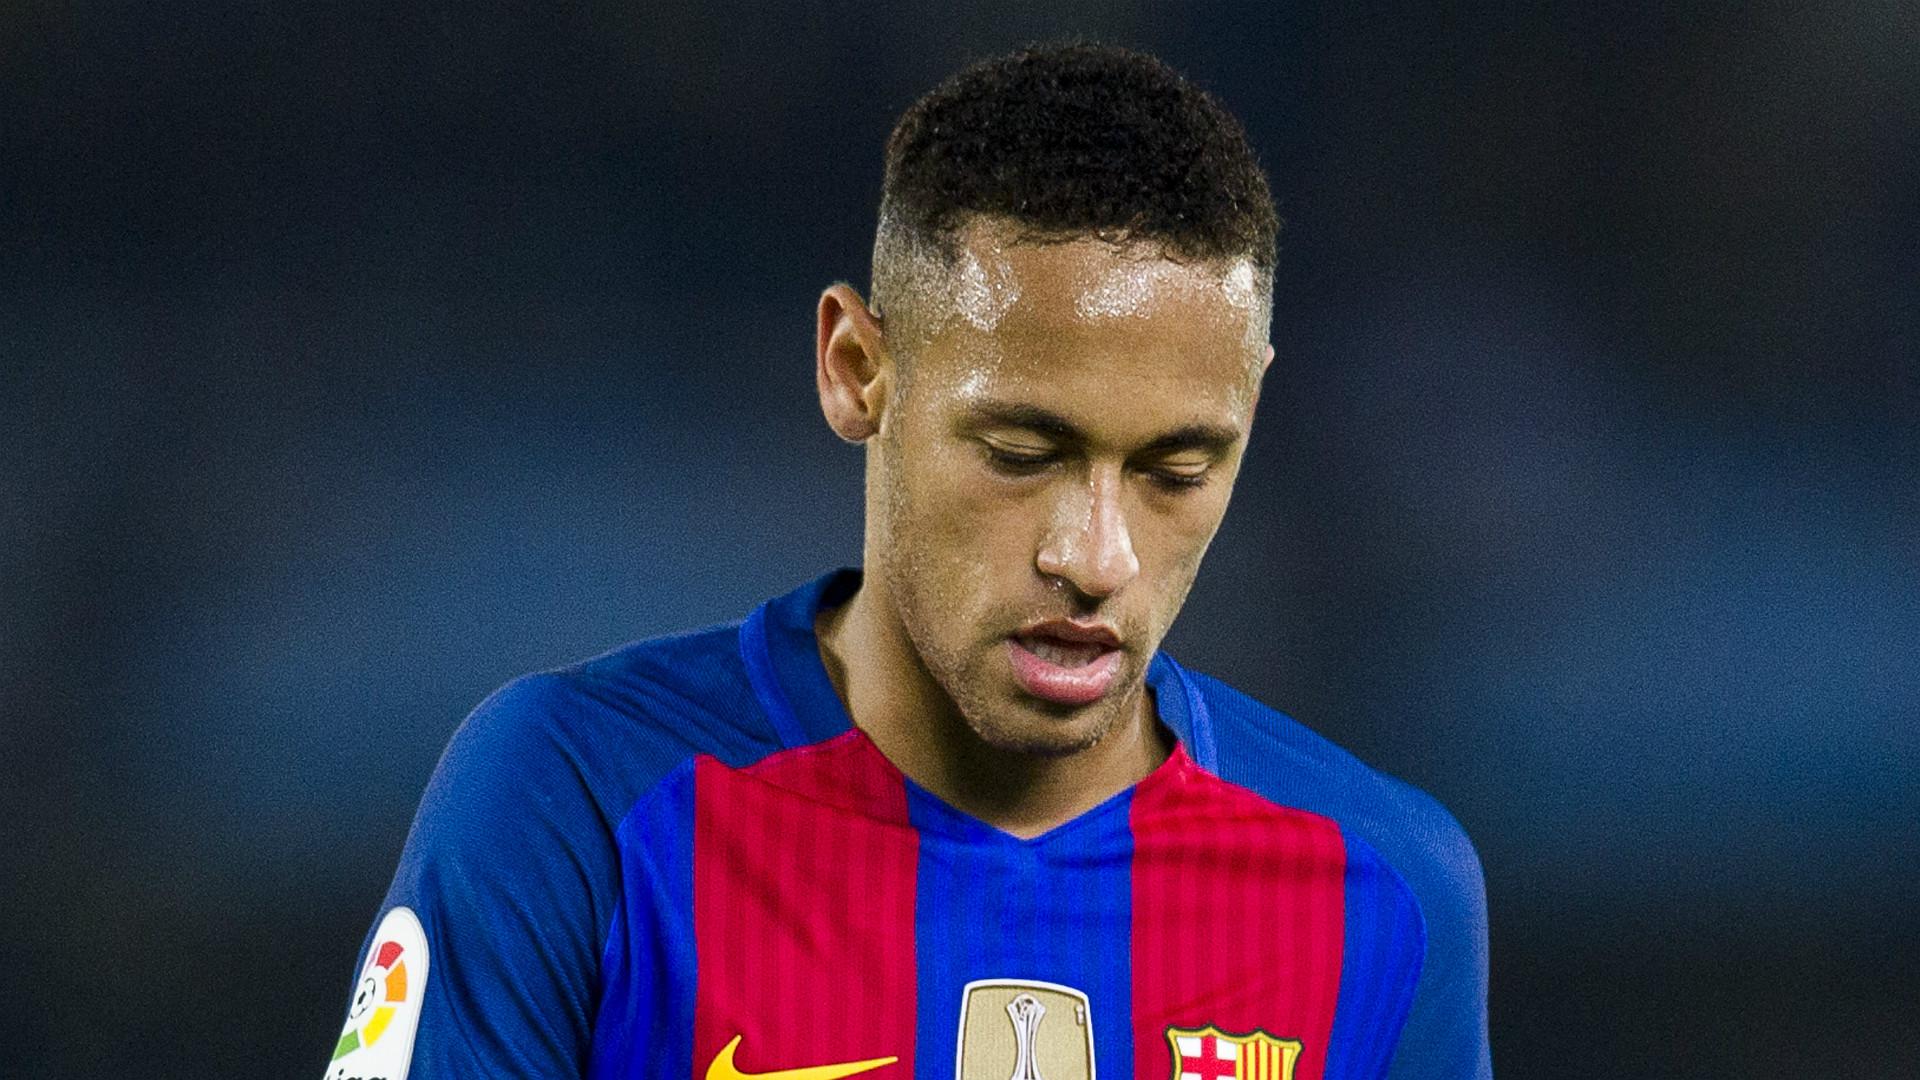 neymar-real-sociedad-barcelona-la-liga-2